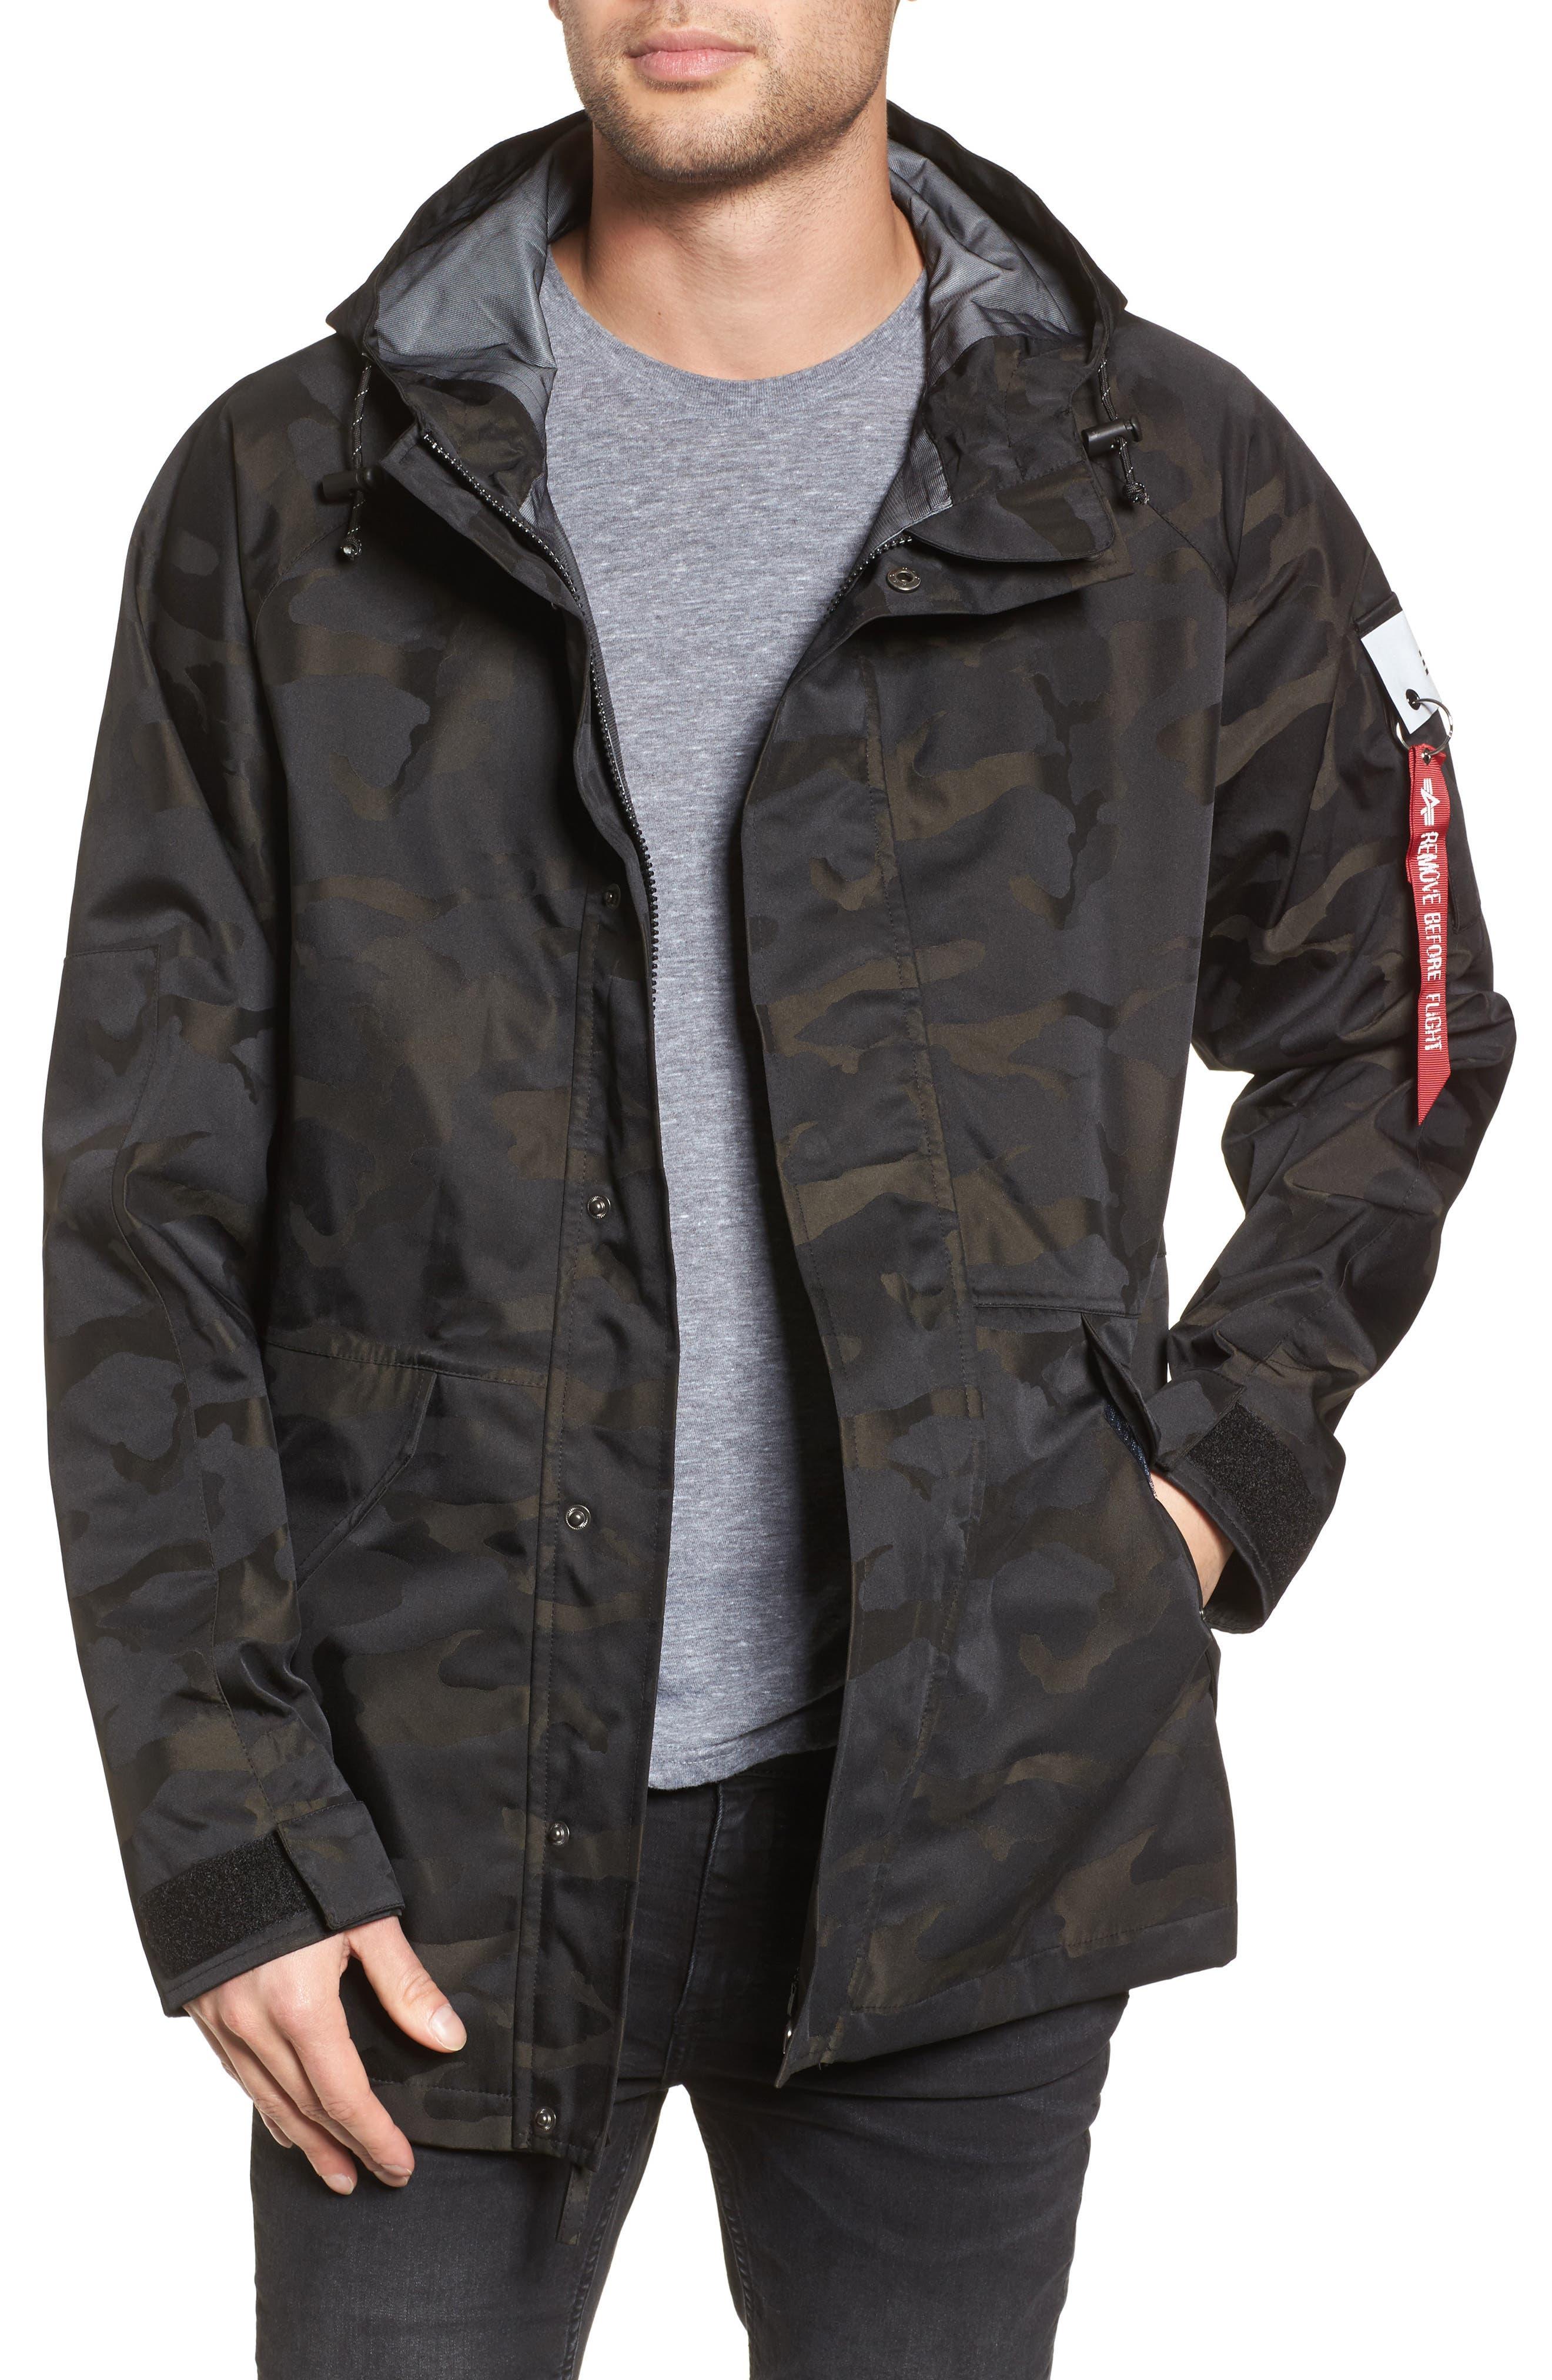 Torrent Camo Jacket,                             Main thumbnail 1, color,                             Black Camo